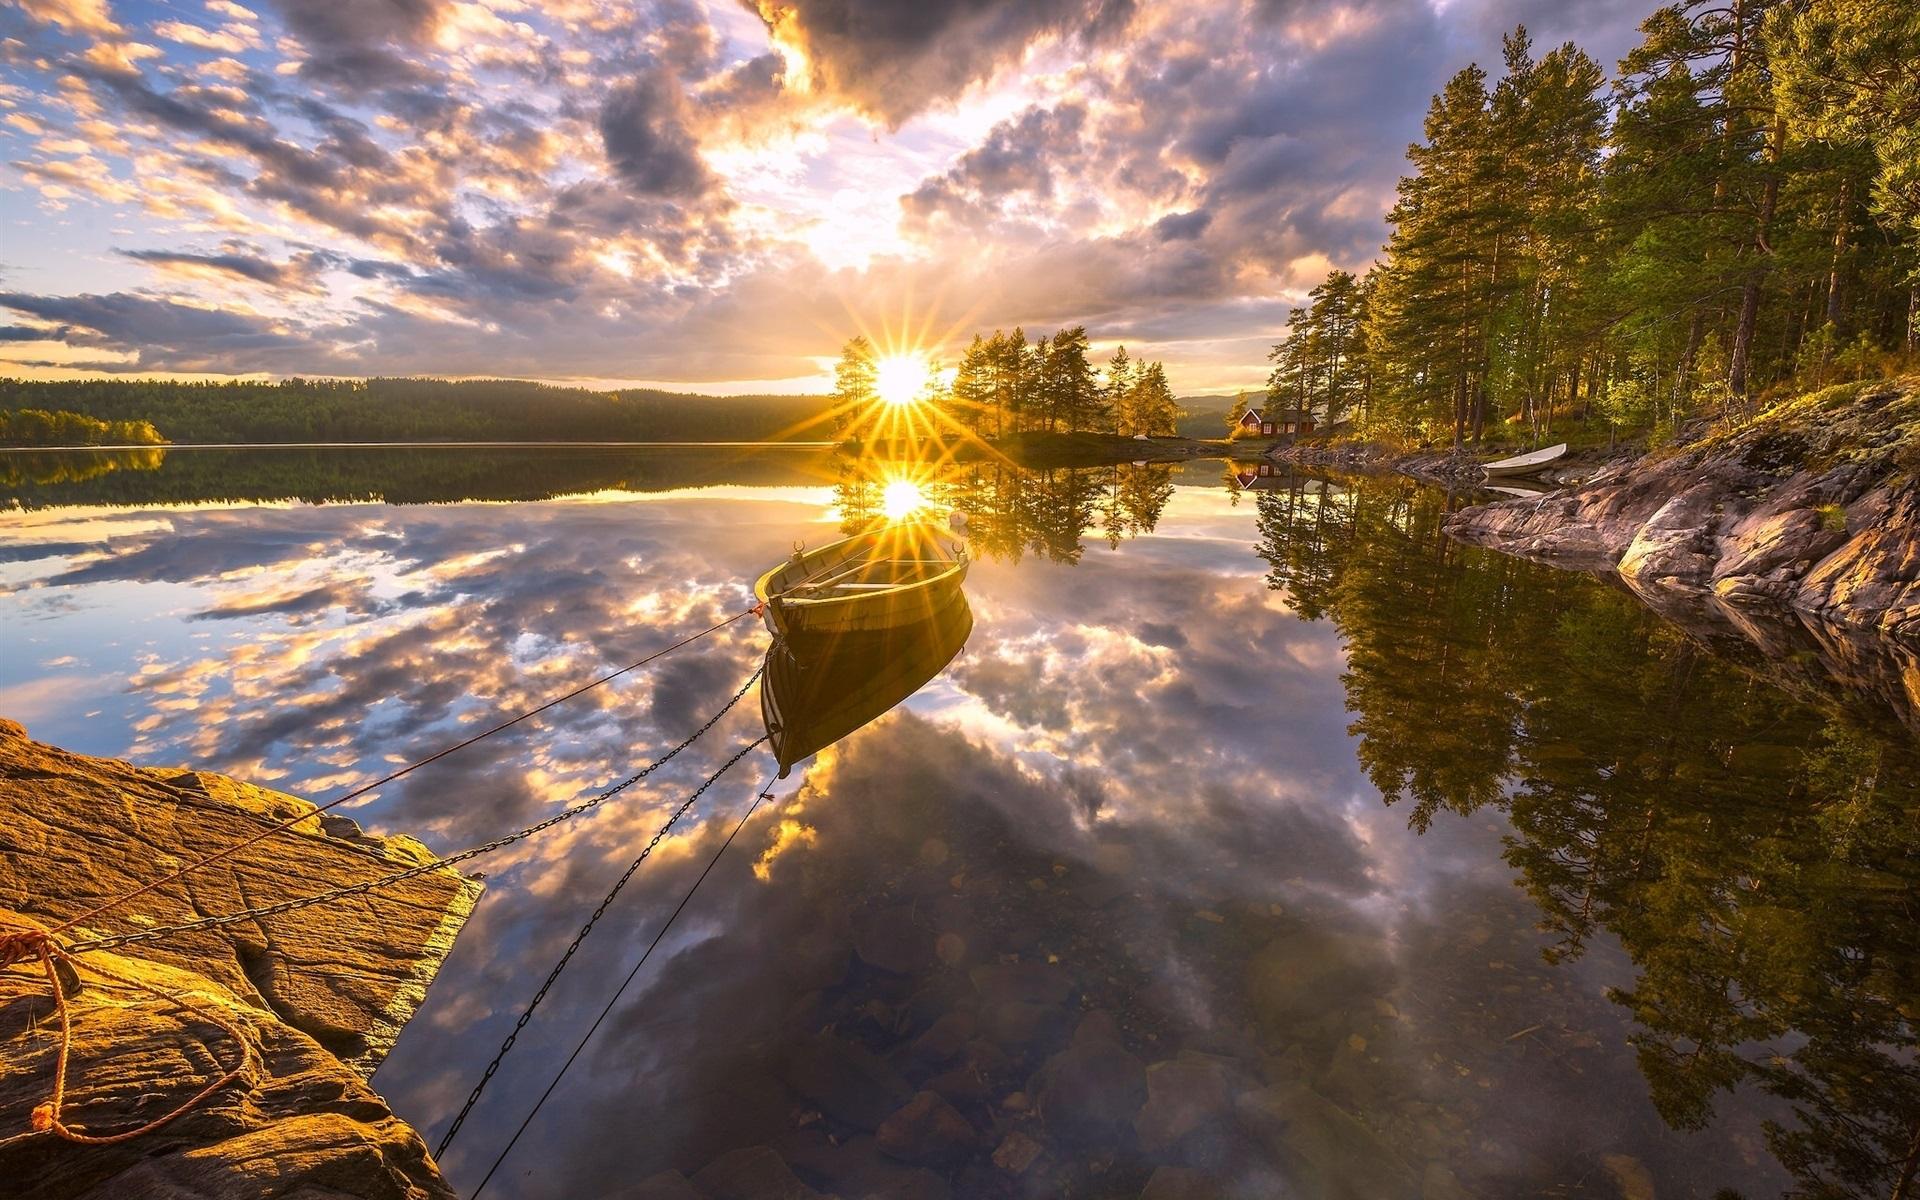 Beautiful Fall Wallpapers For Desktop Ringerike Norway Beautiful Sunset Lake Water